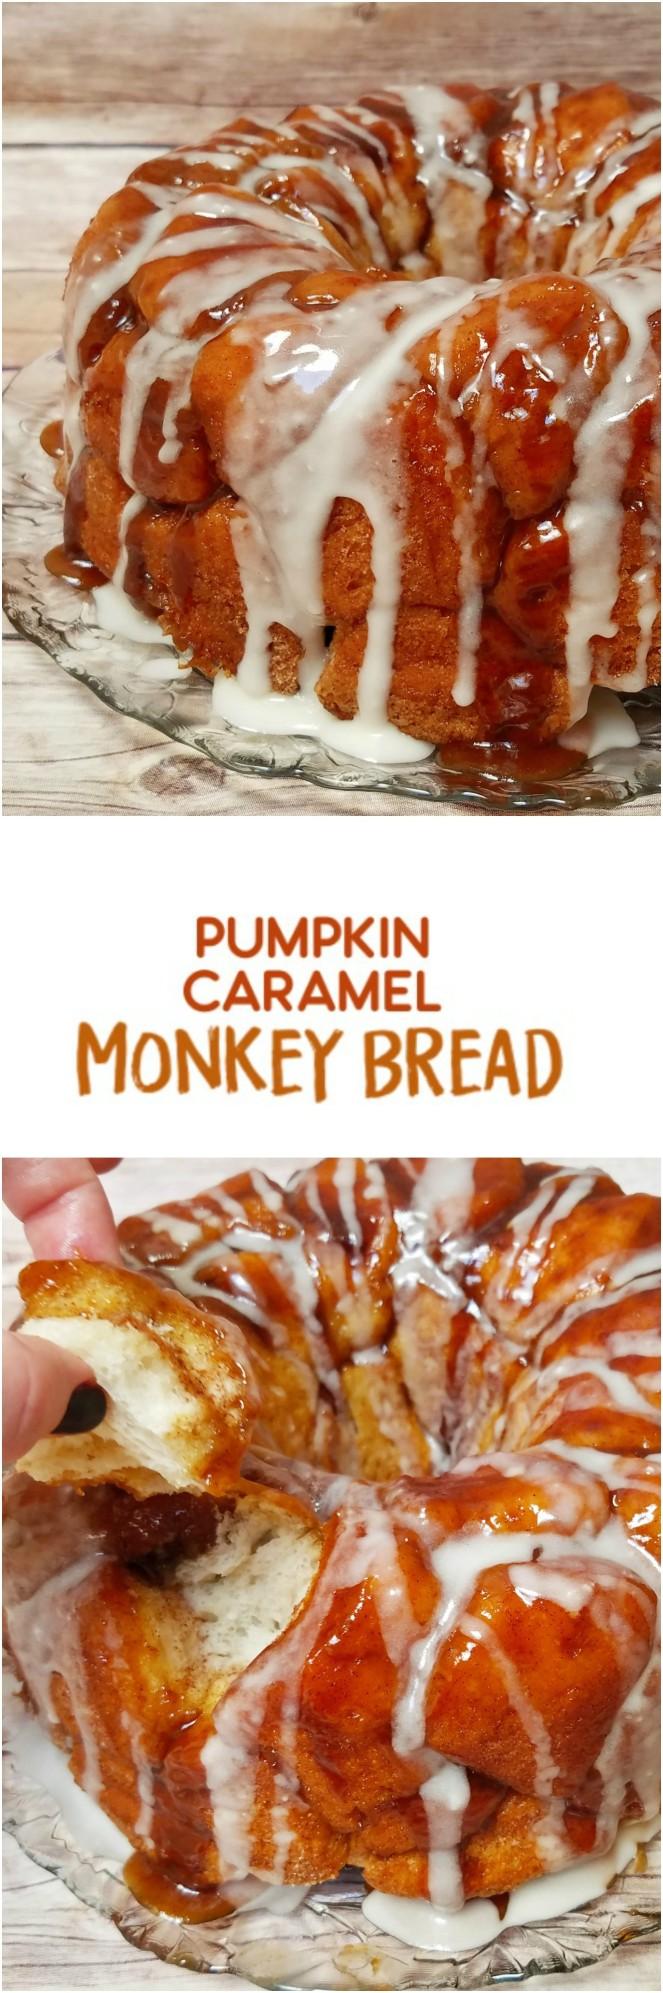 Pumpkin Caramel Monkey Bread by Rumbly in my Tumbly